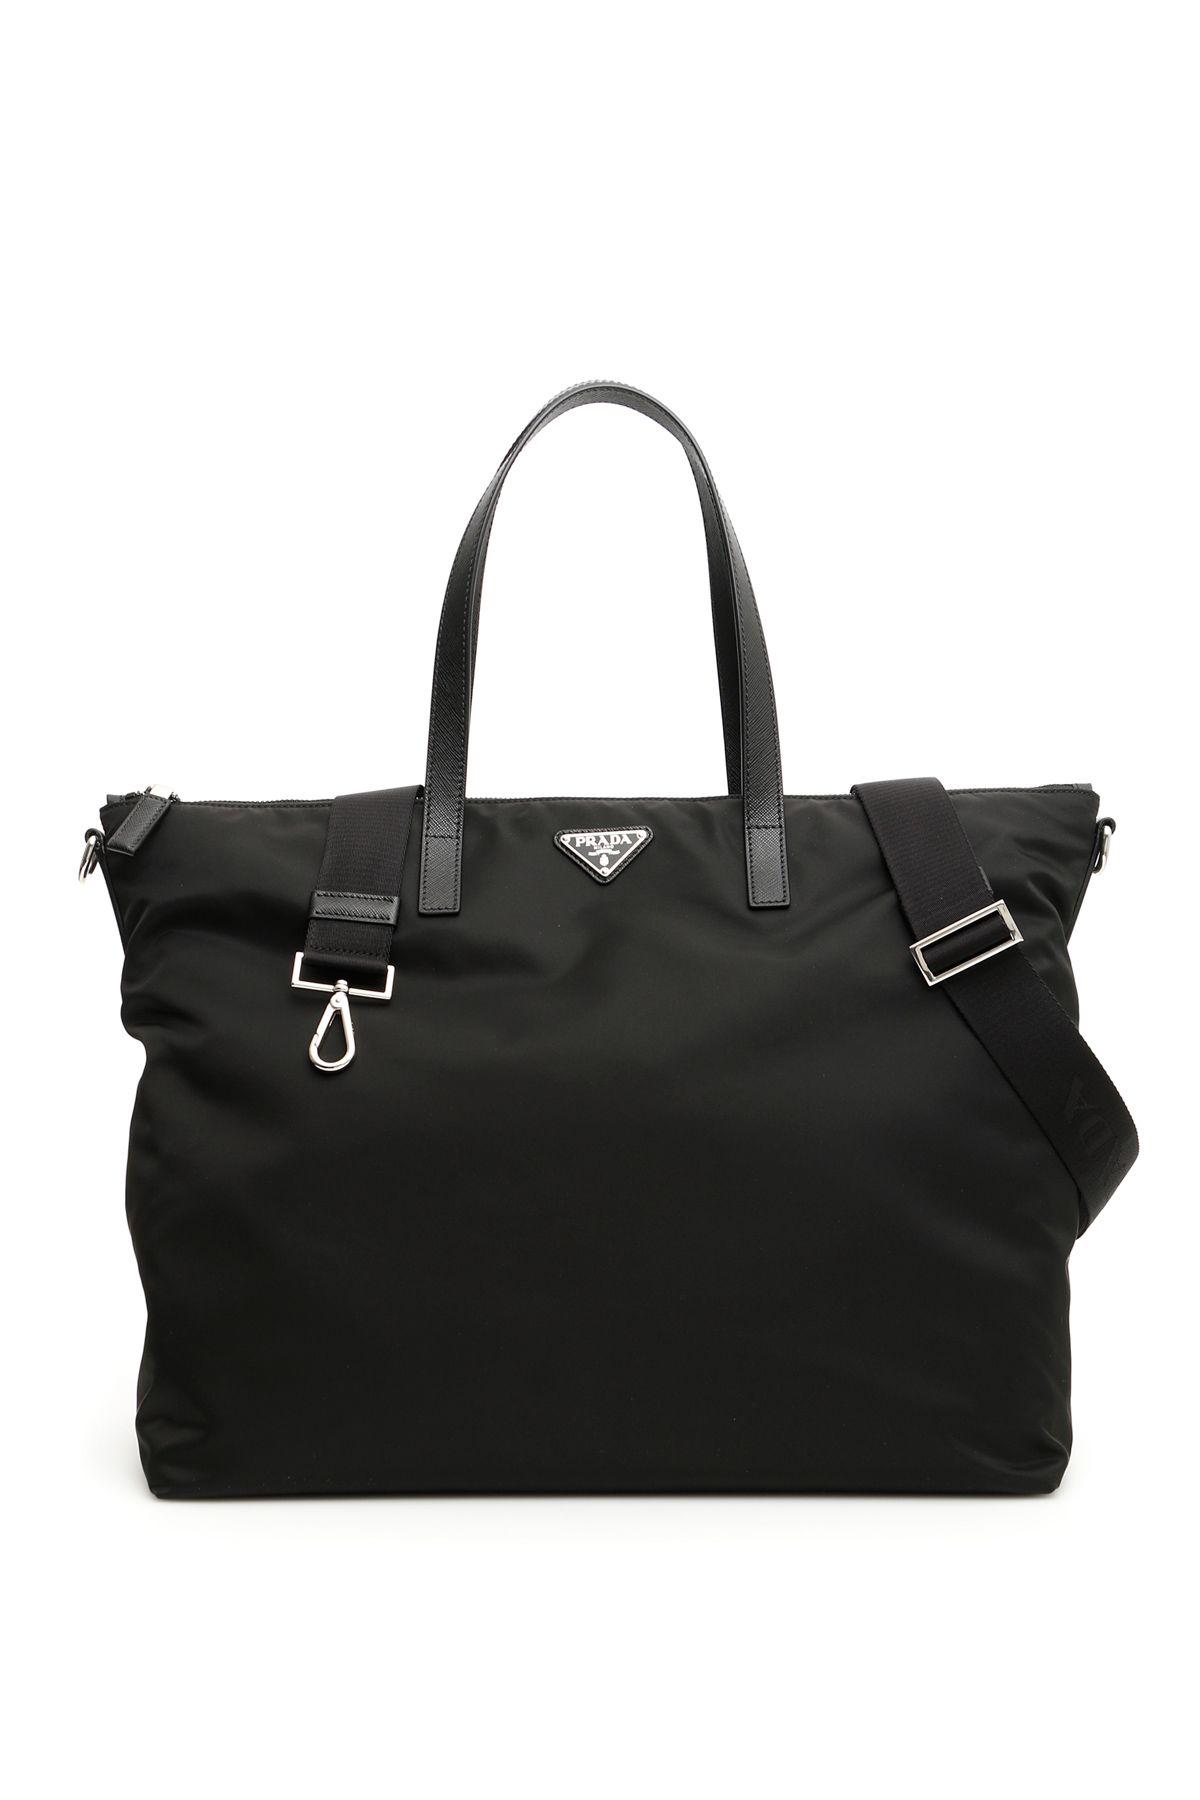 655b84f2f09e Prada Prada Nylon + Saffiano Tote Bag - NERO (Black) - 10962081 ...